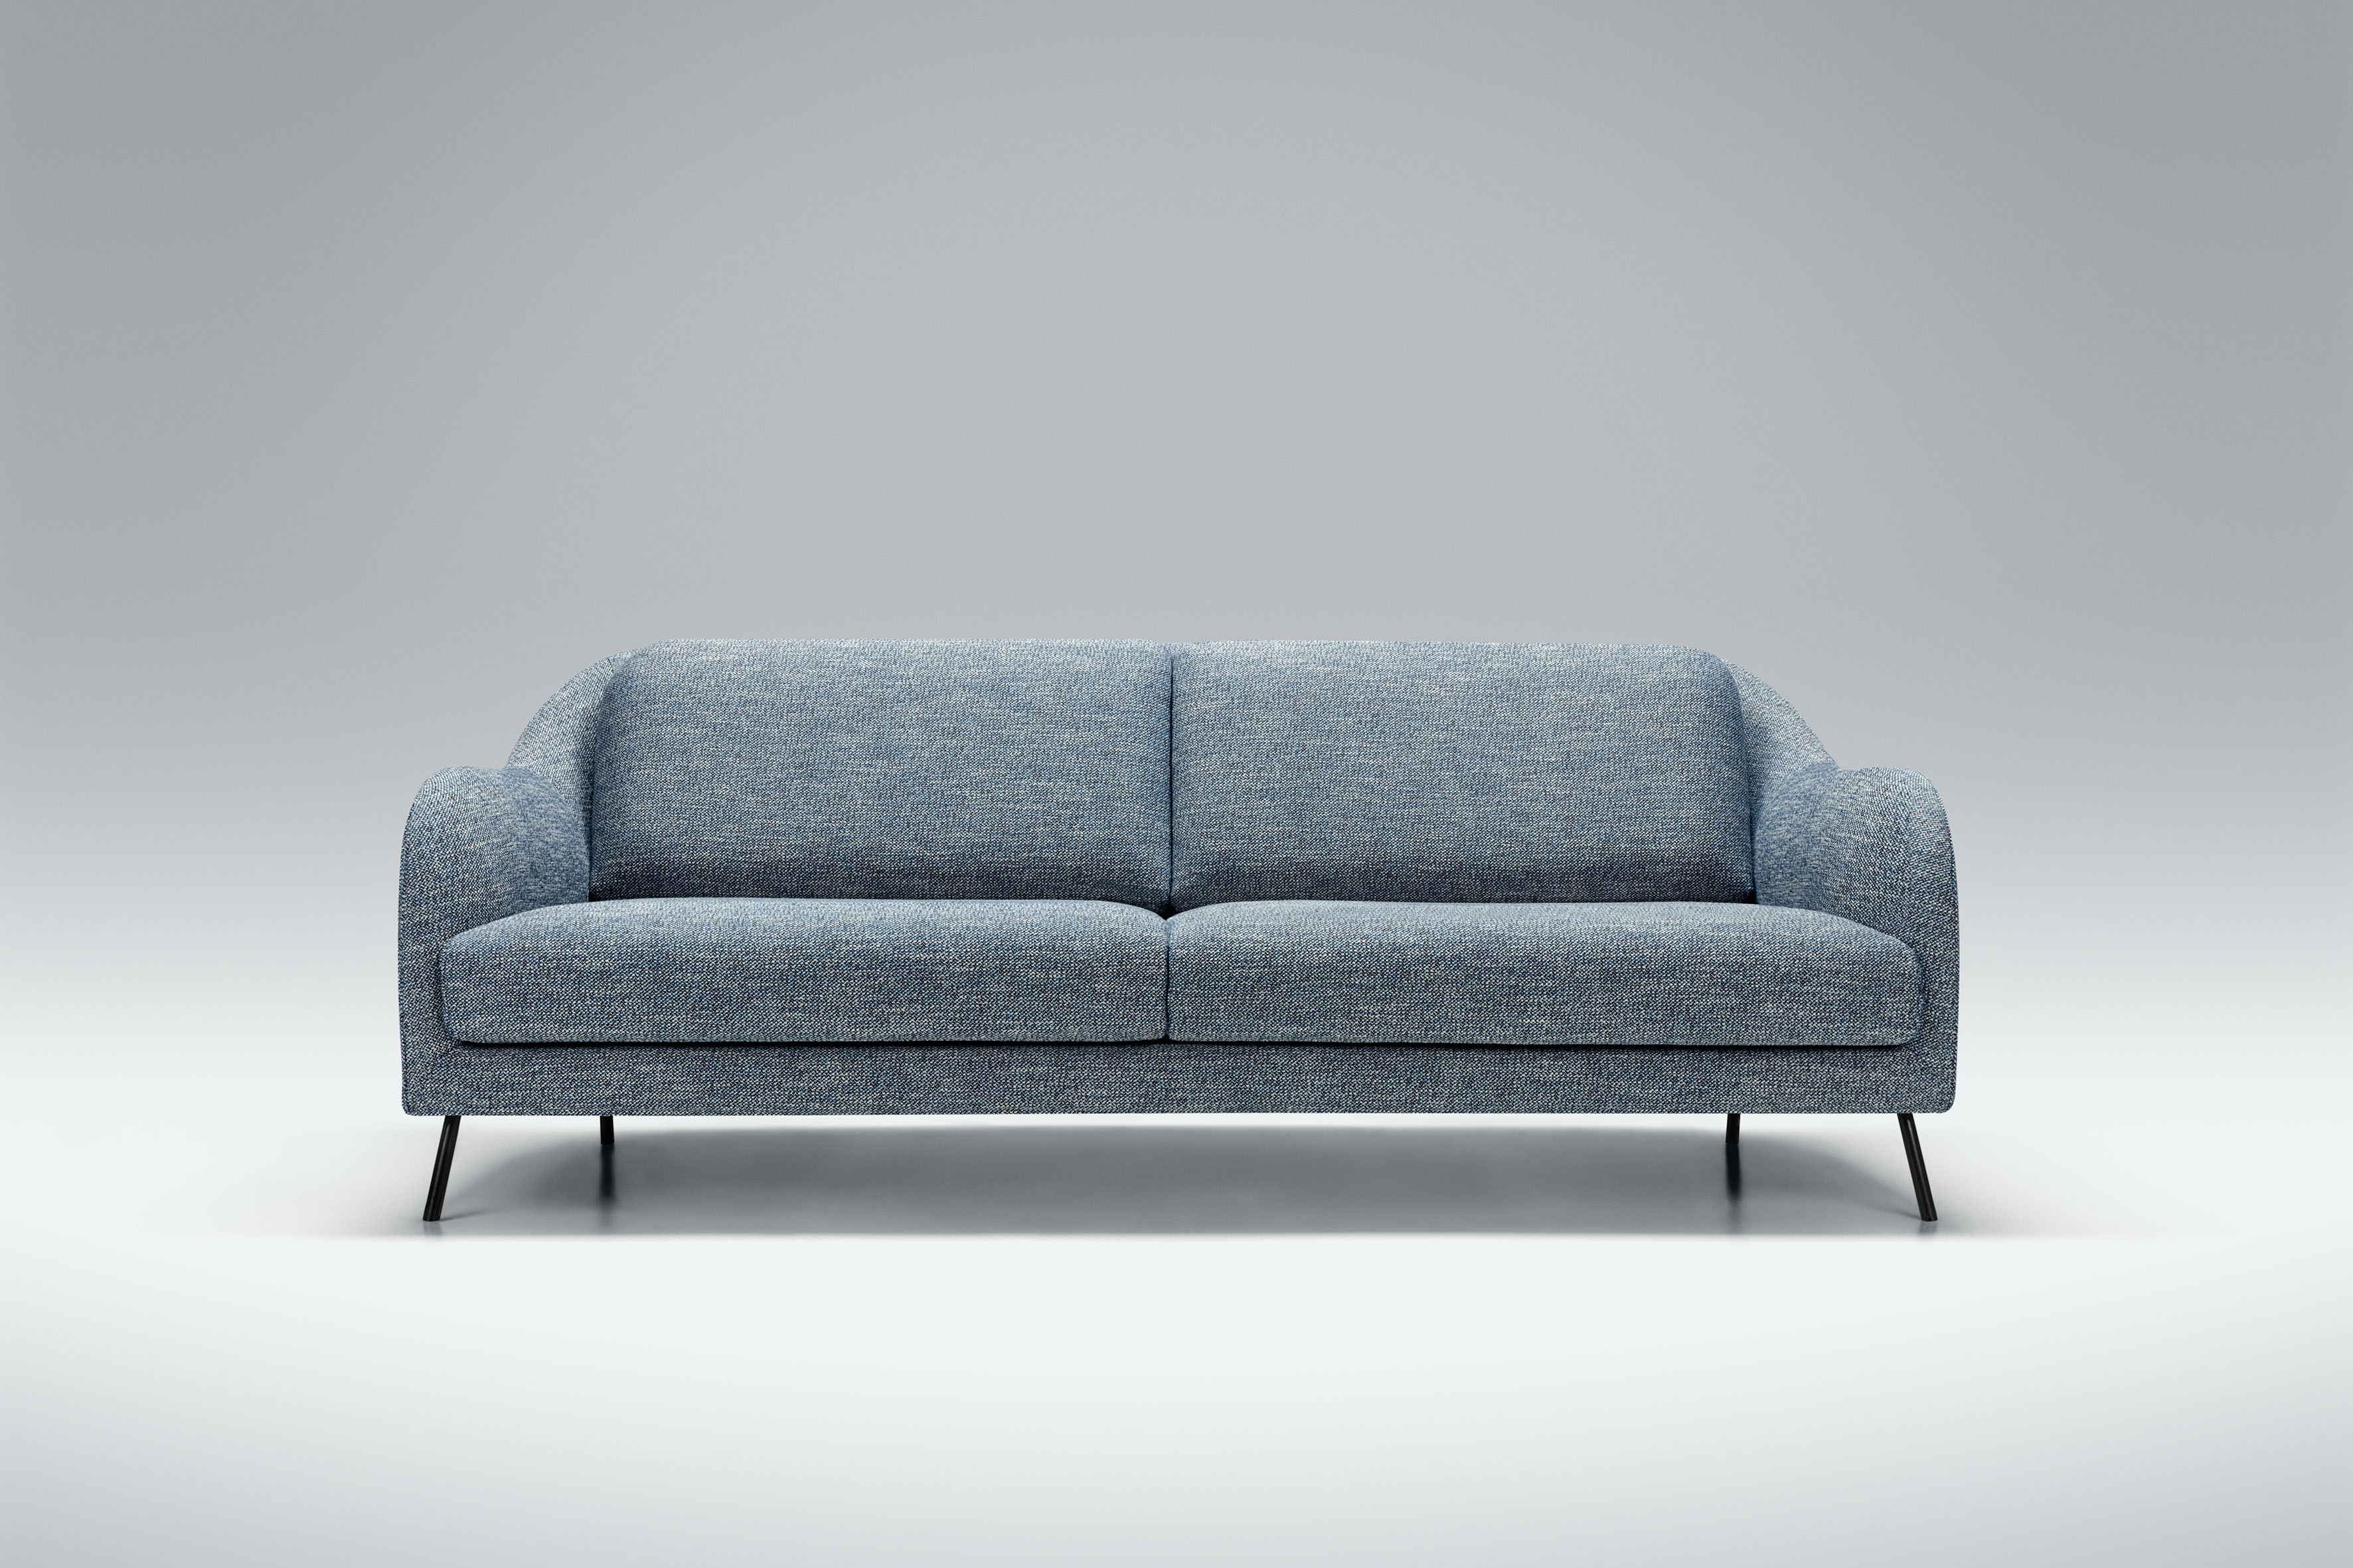 Ibsen 3 seater sofa